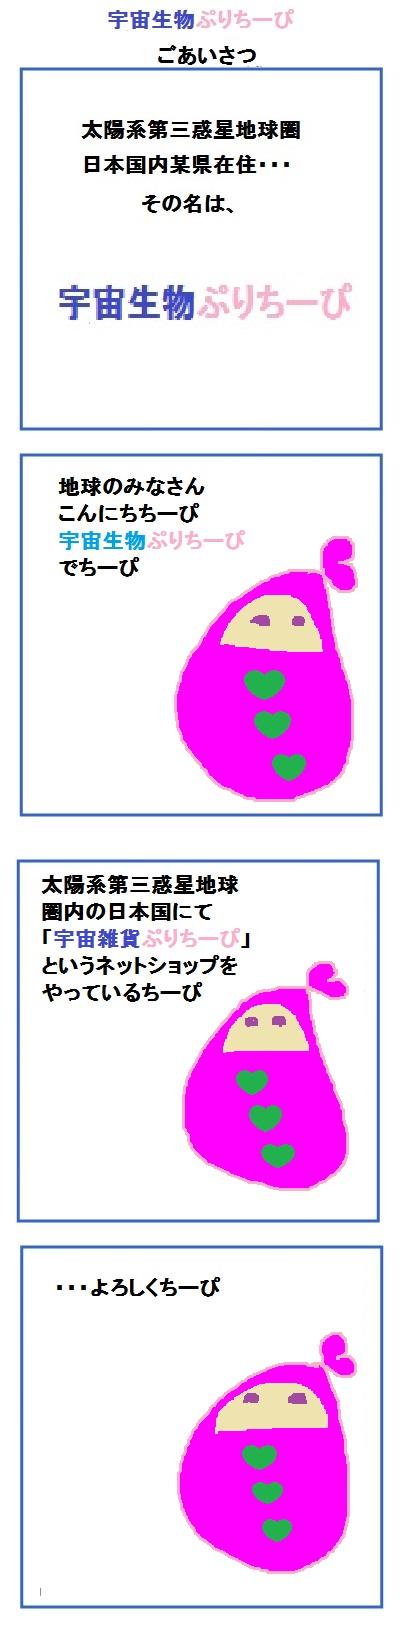 pry_blog_first.jpg